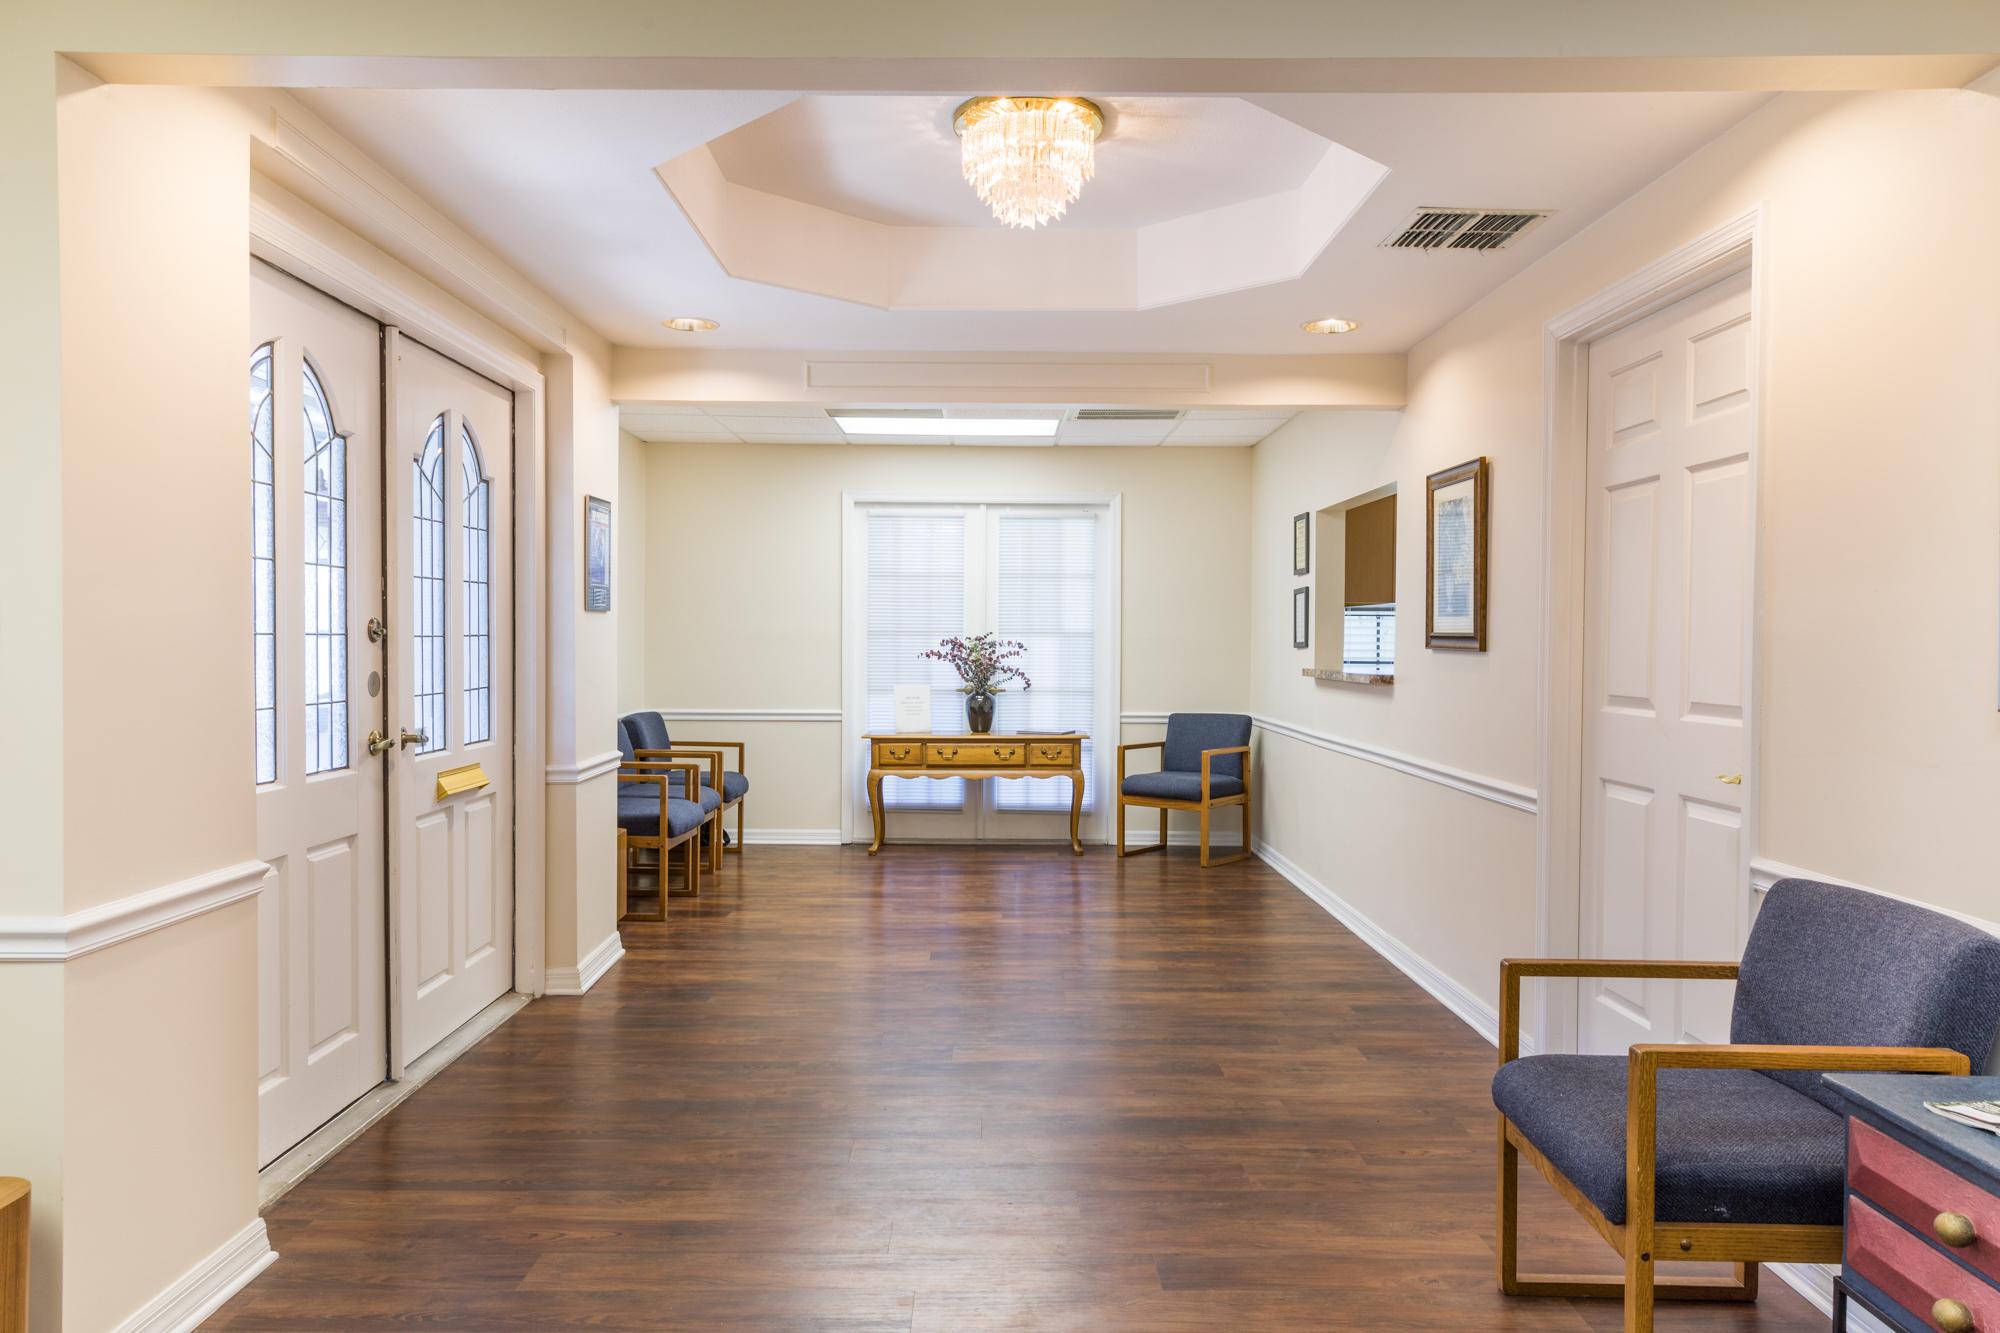 Ritch Neurology Office Renovations